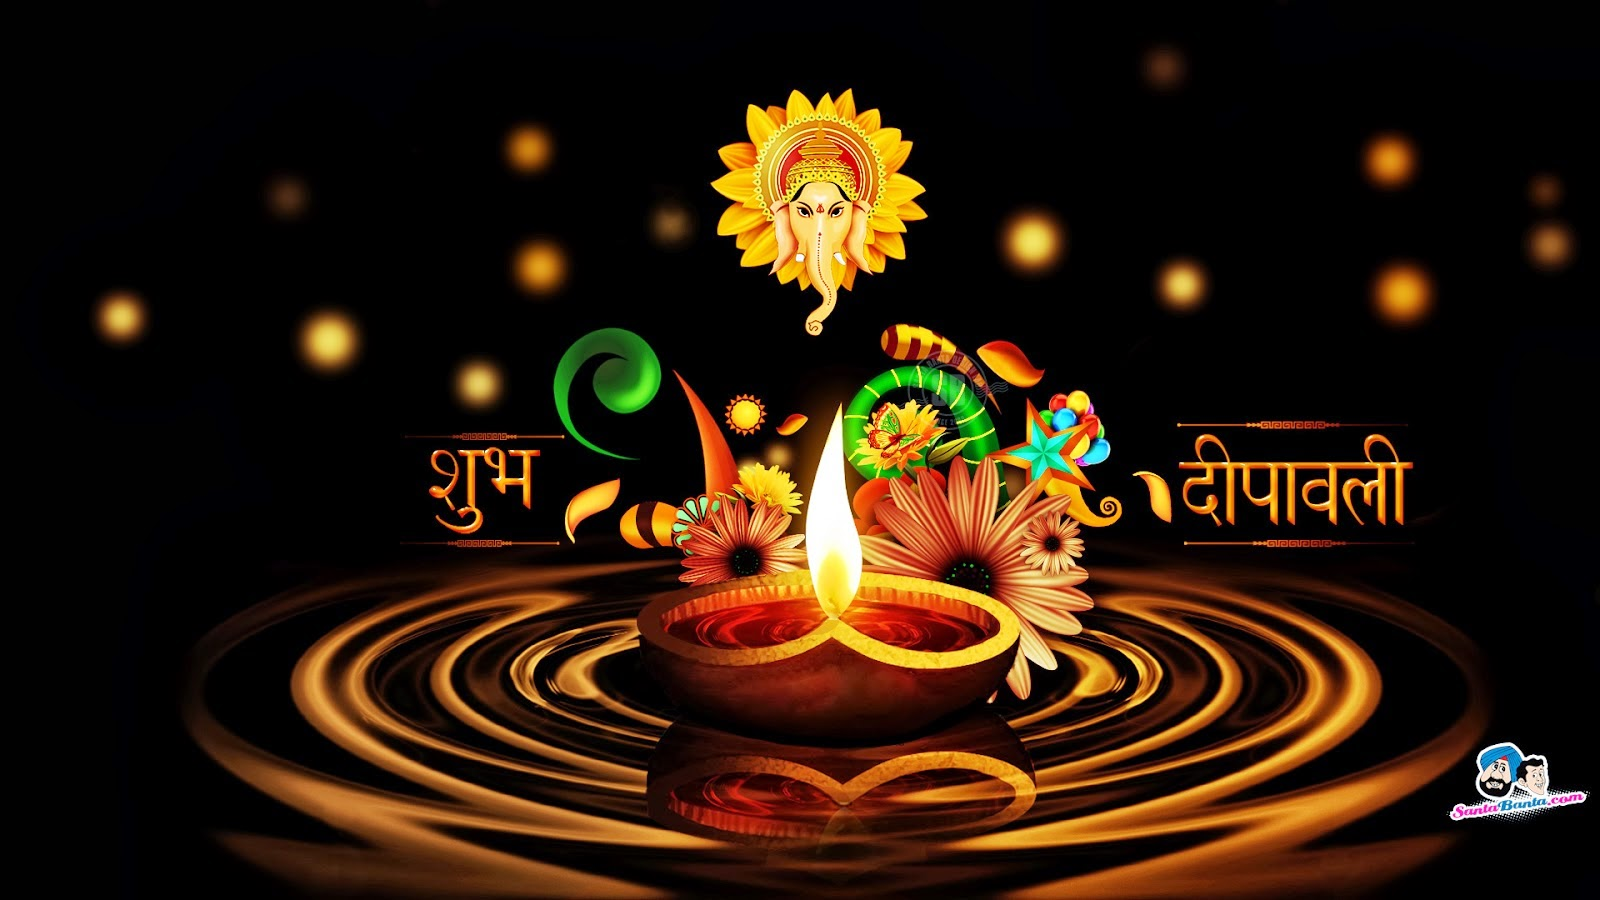 Subh diwali image